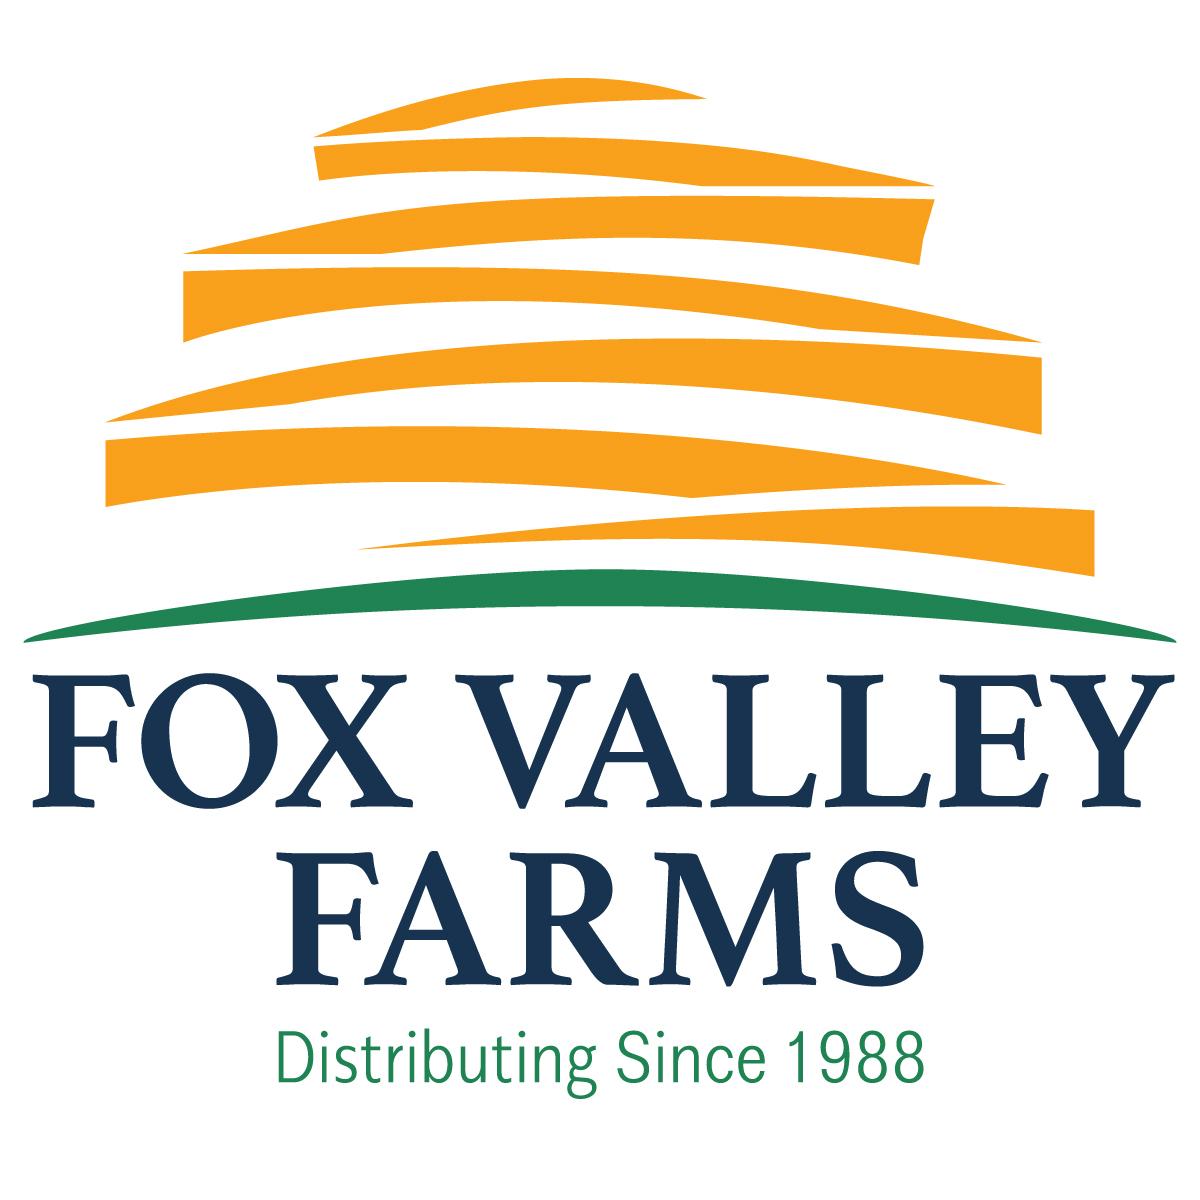 Distributing Since 1988